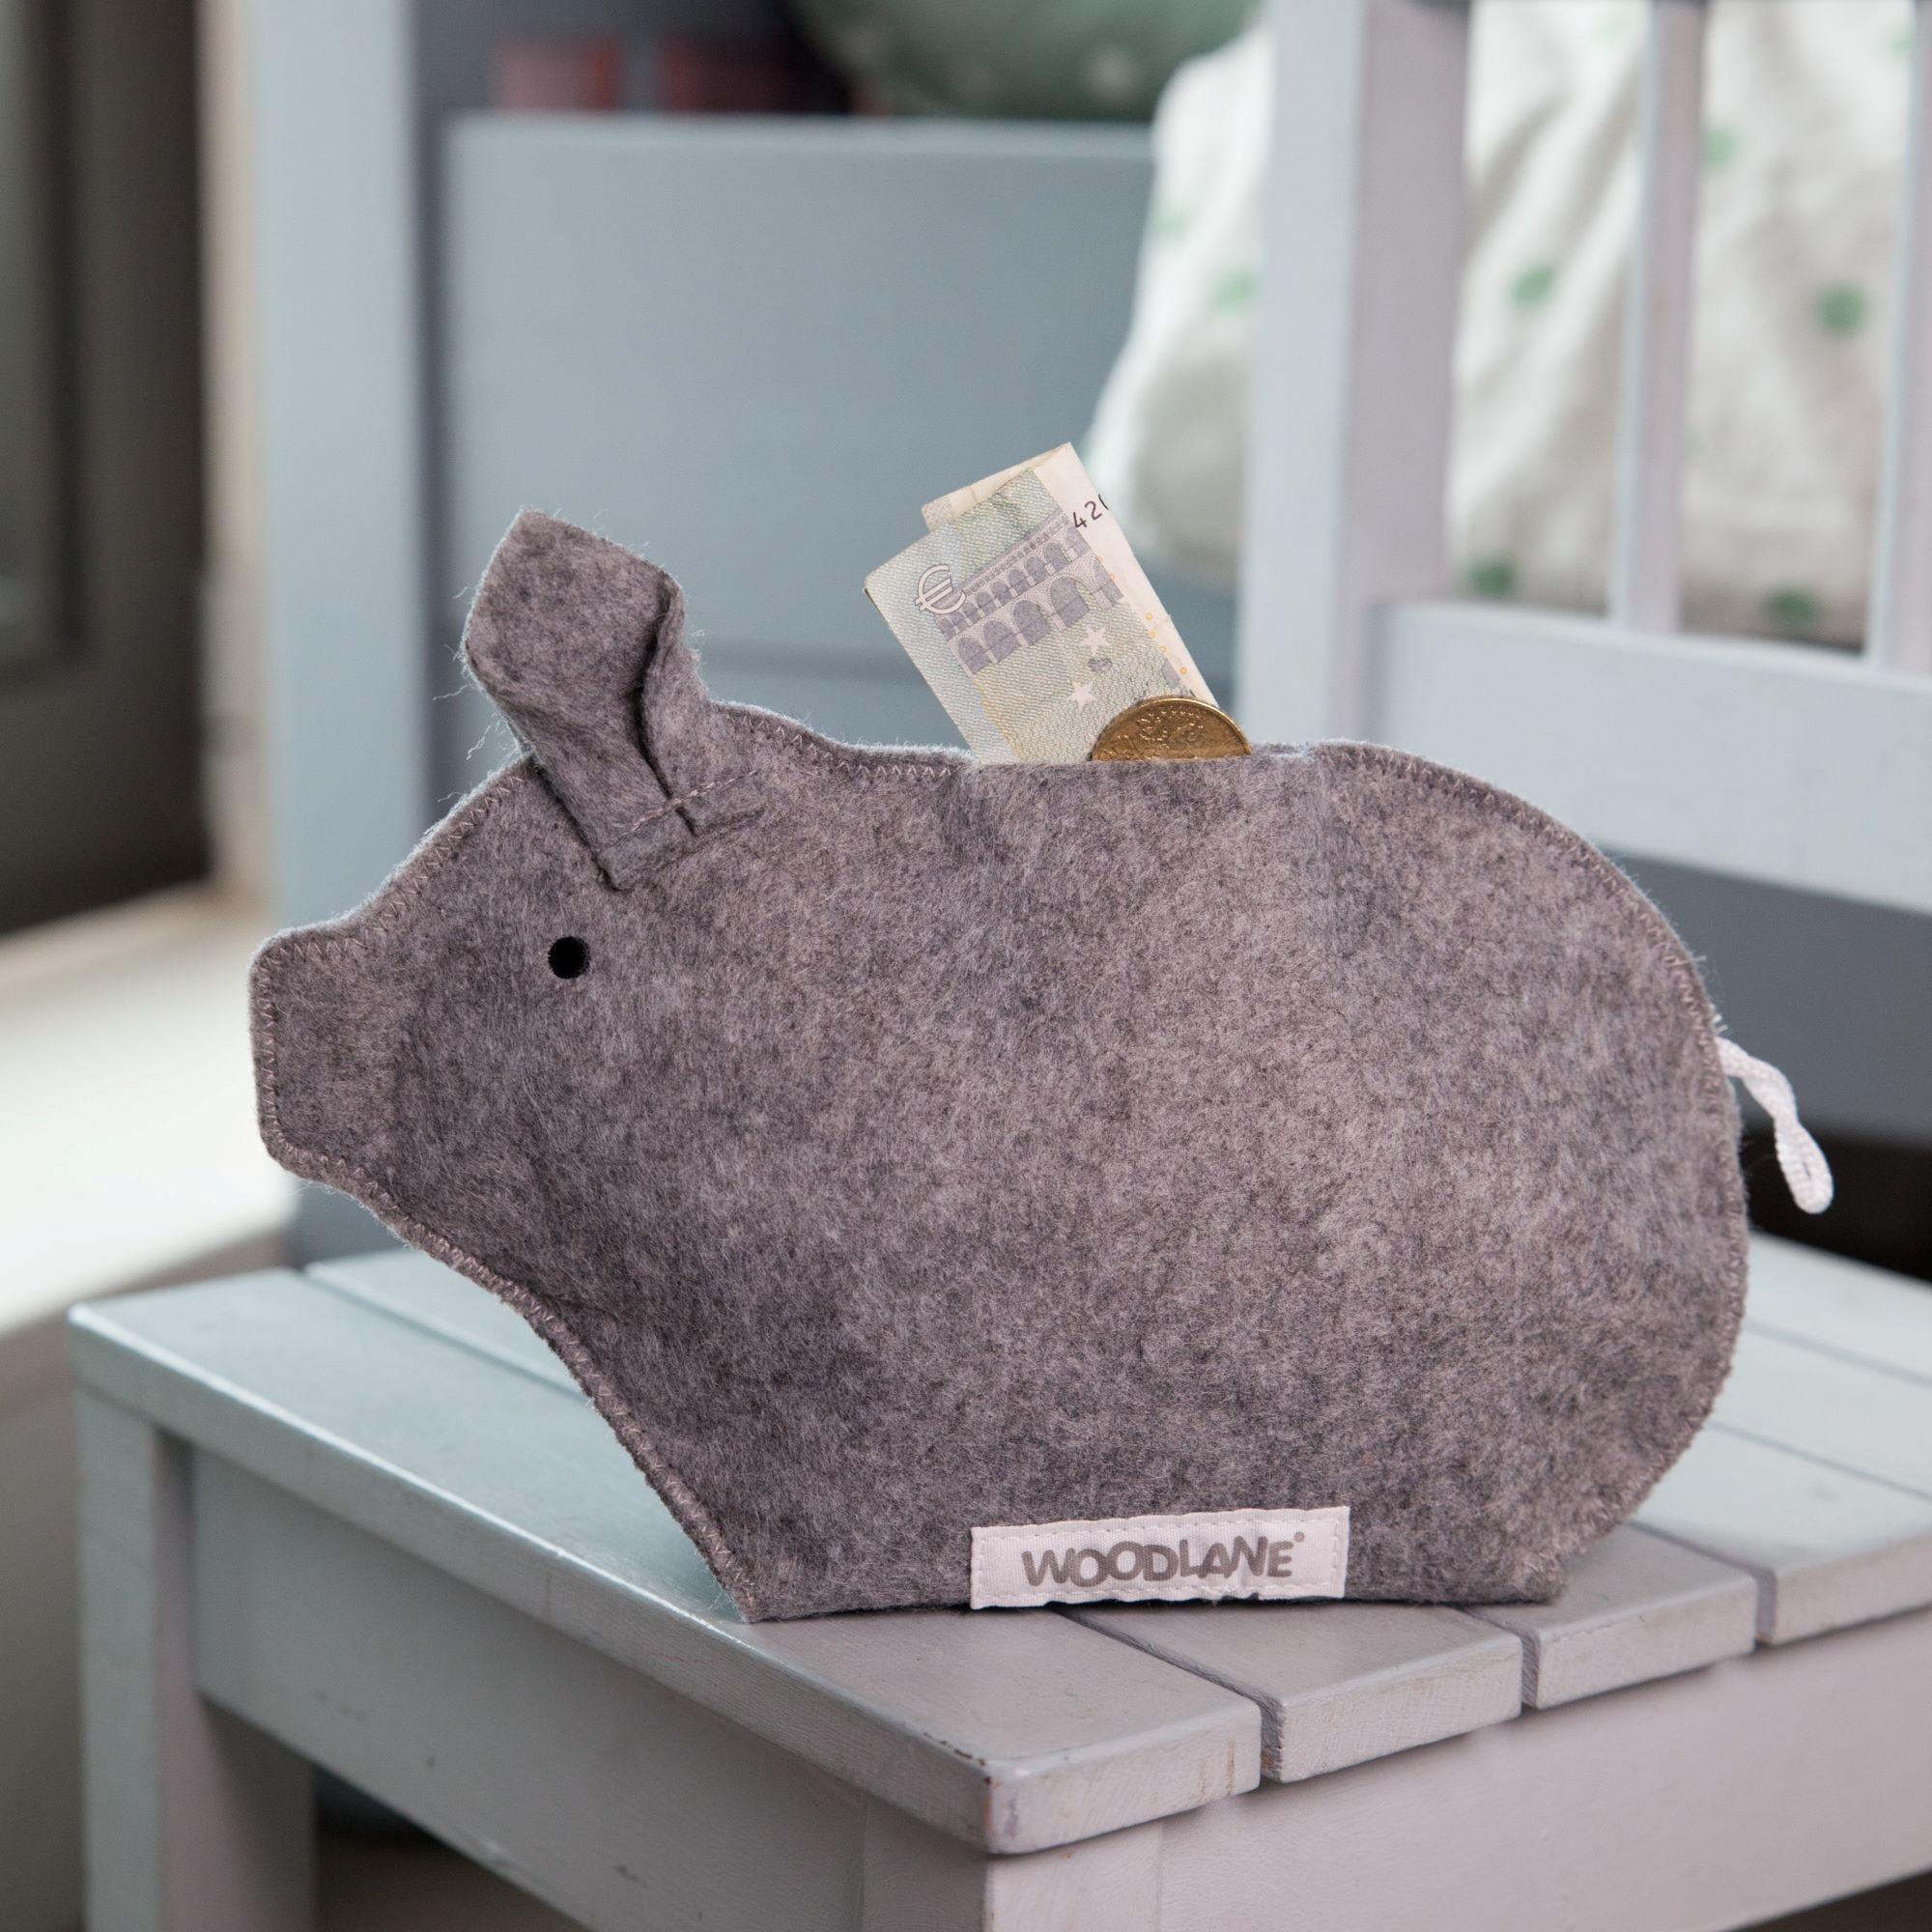 Woodlane Piggy-Frederique van Gemert-8793